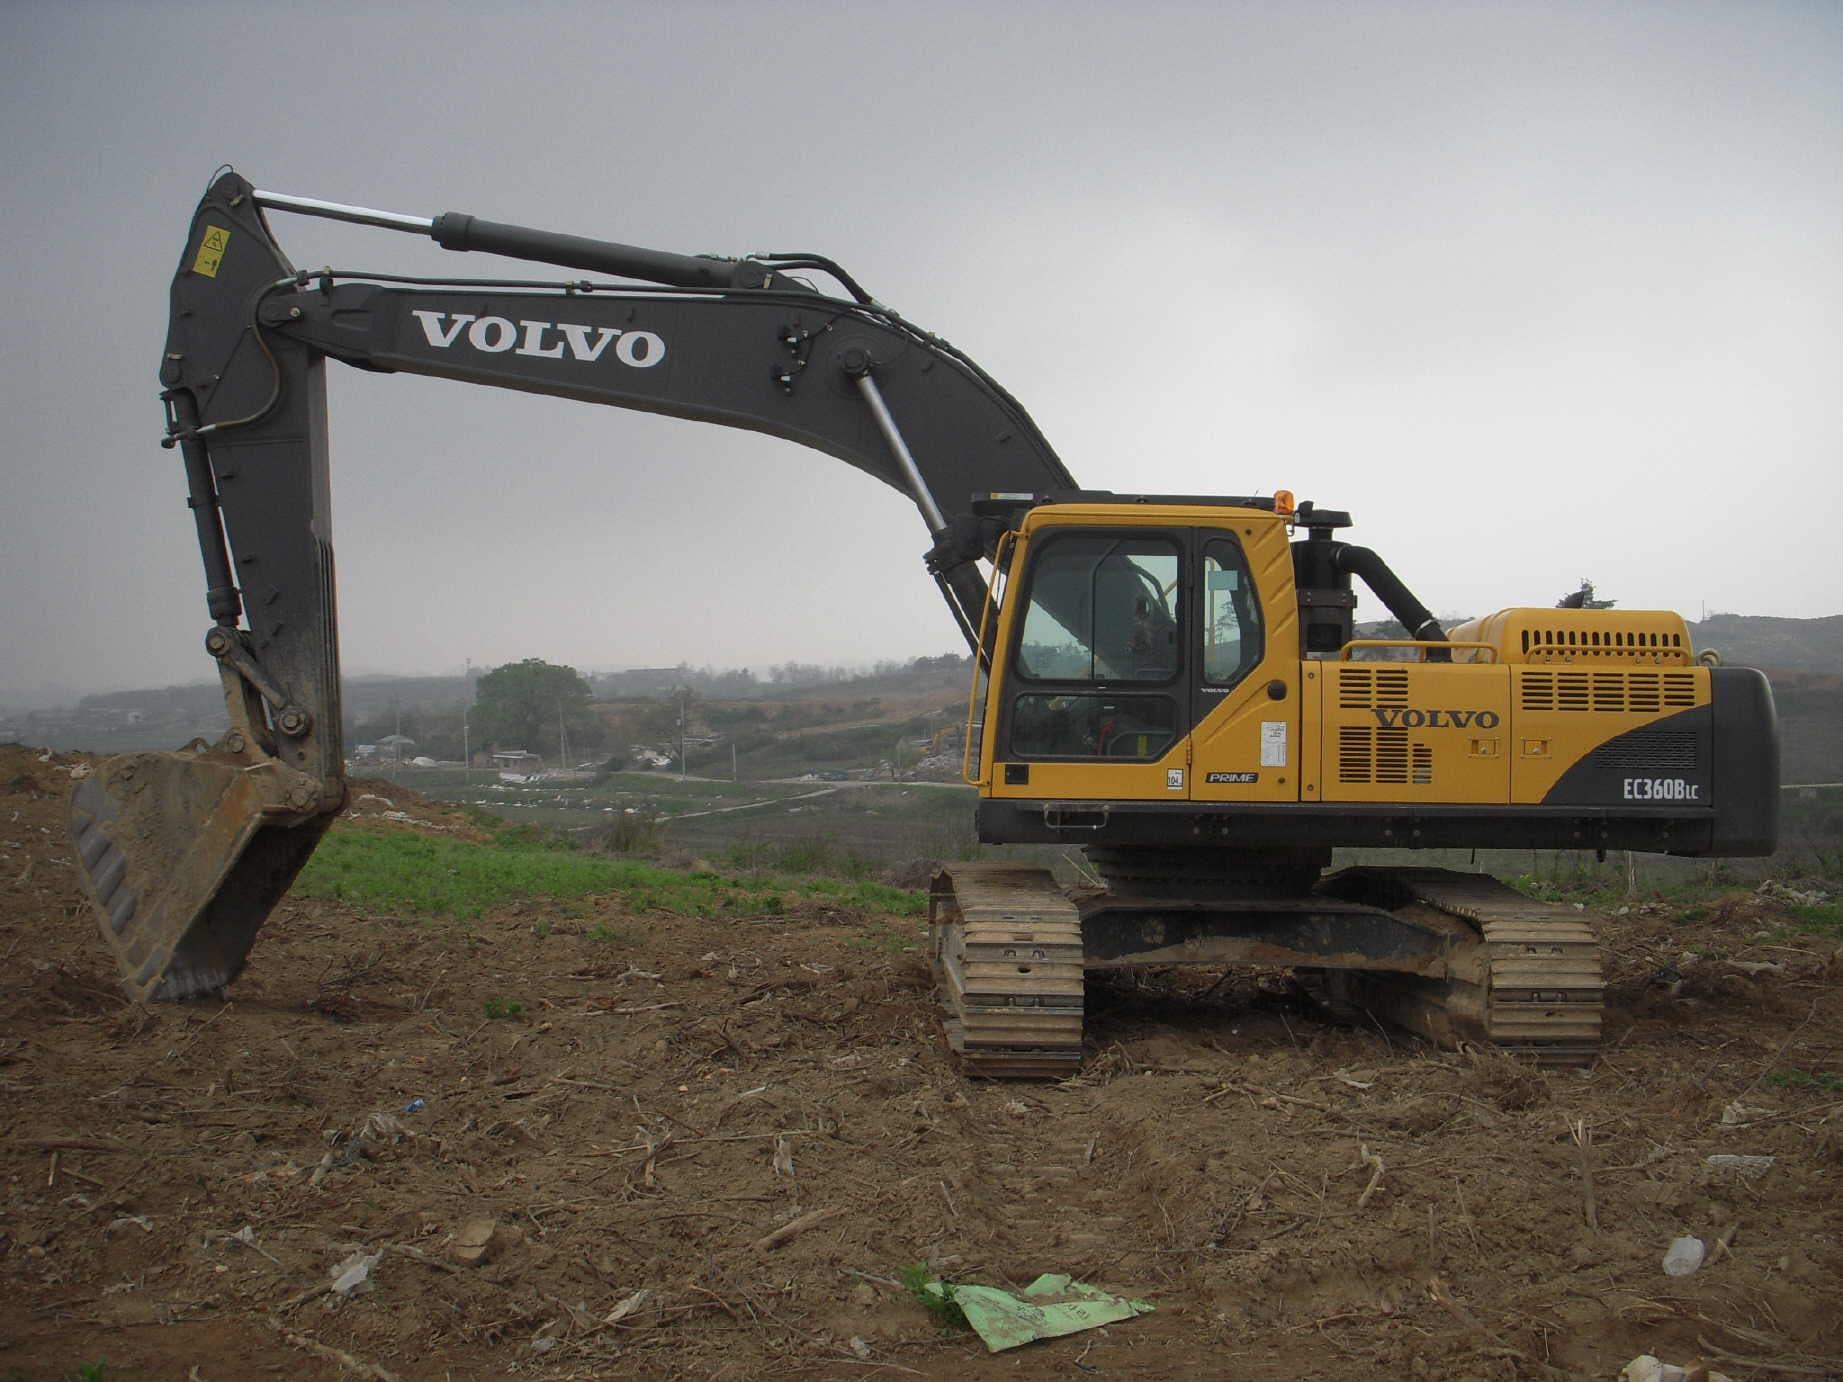 Volvo excavators bbt com